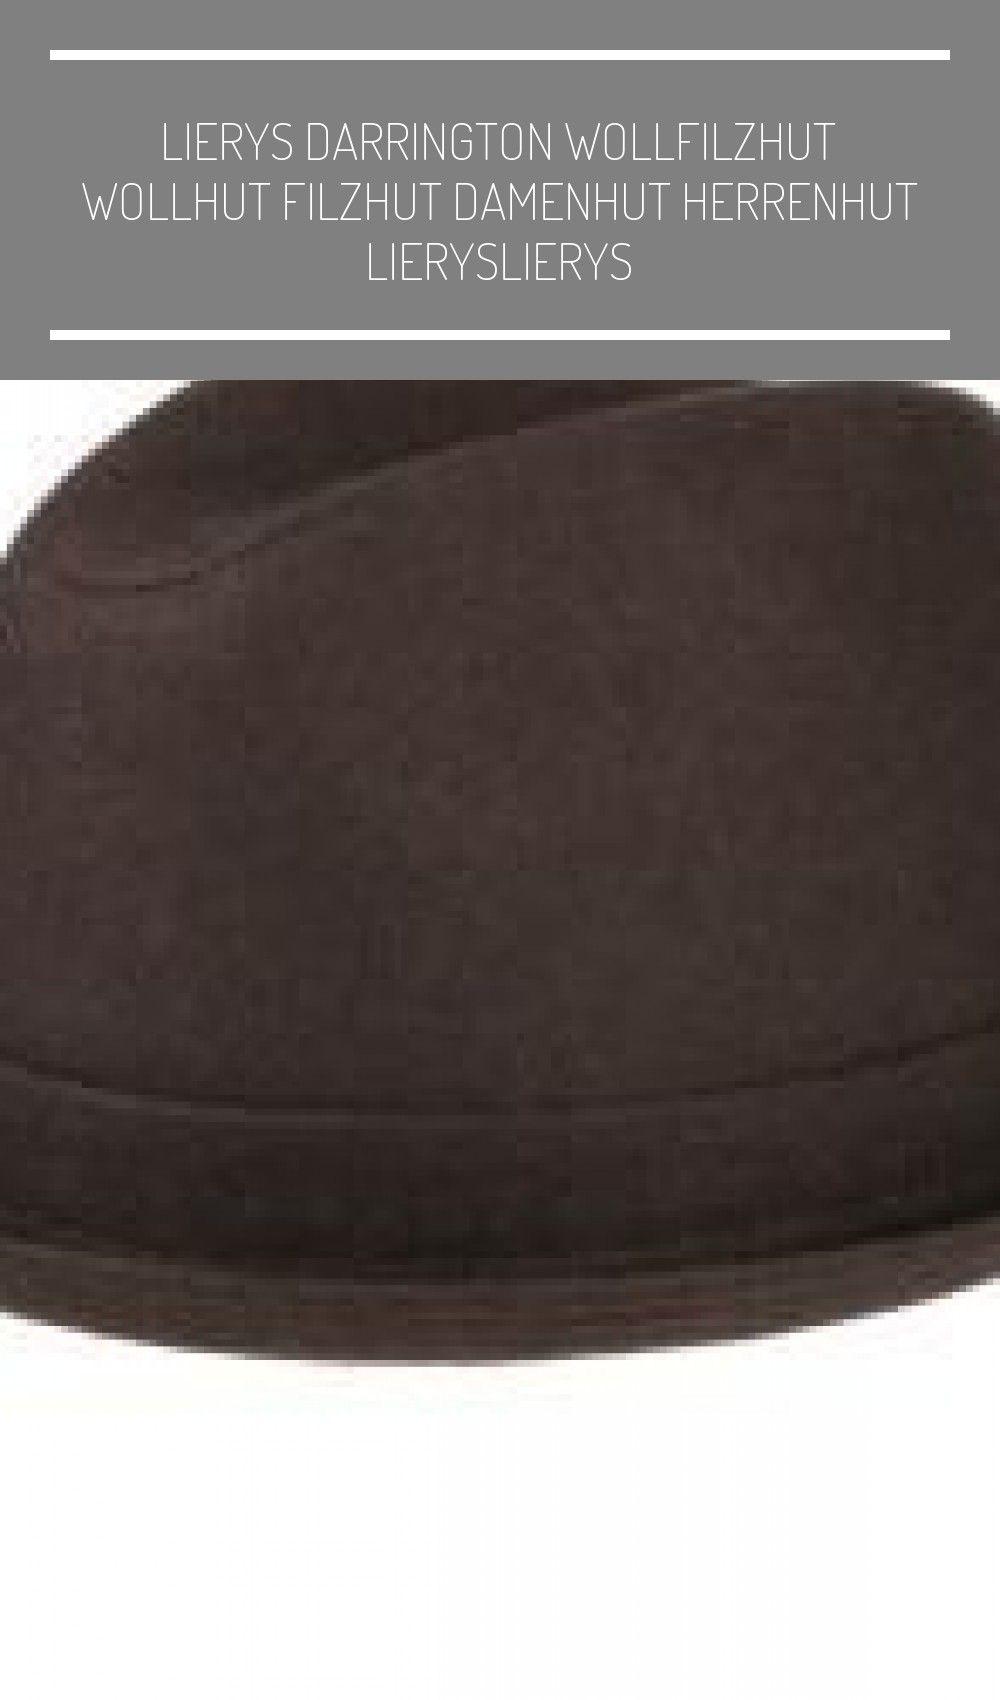 LIERYS Darrington Wollfilzhut Wollhut Filzhut Damenhut Herrenhut Hüte